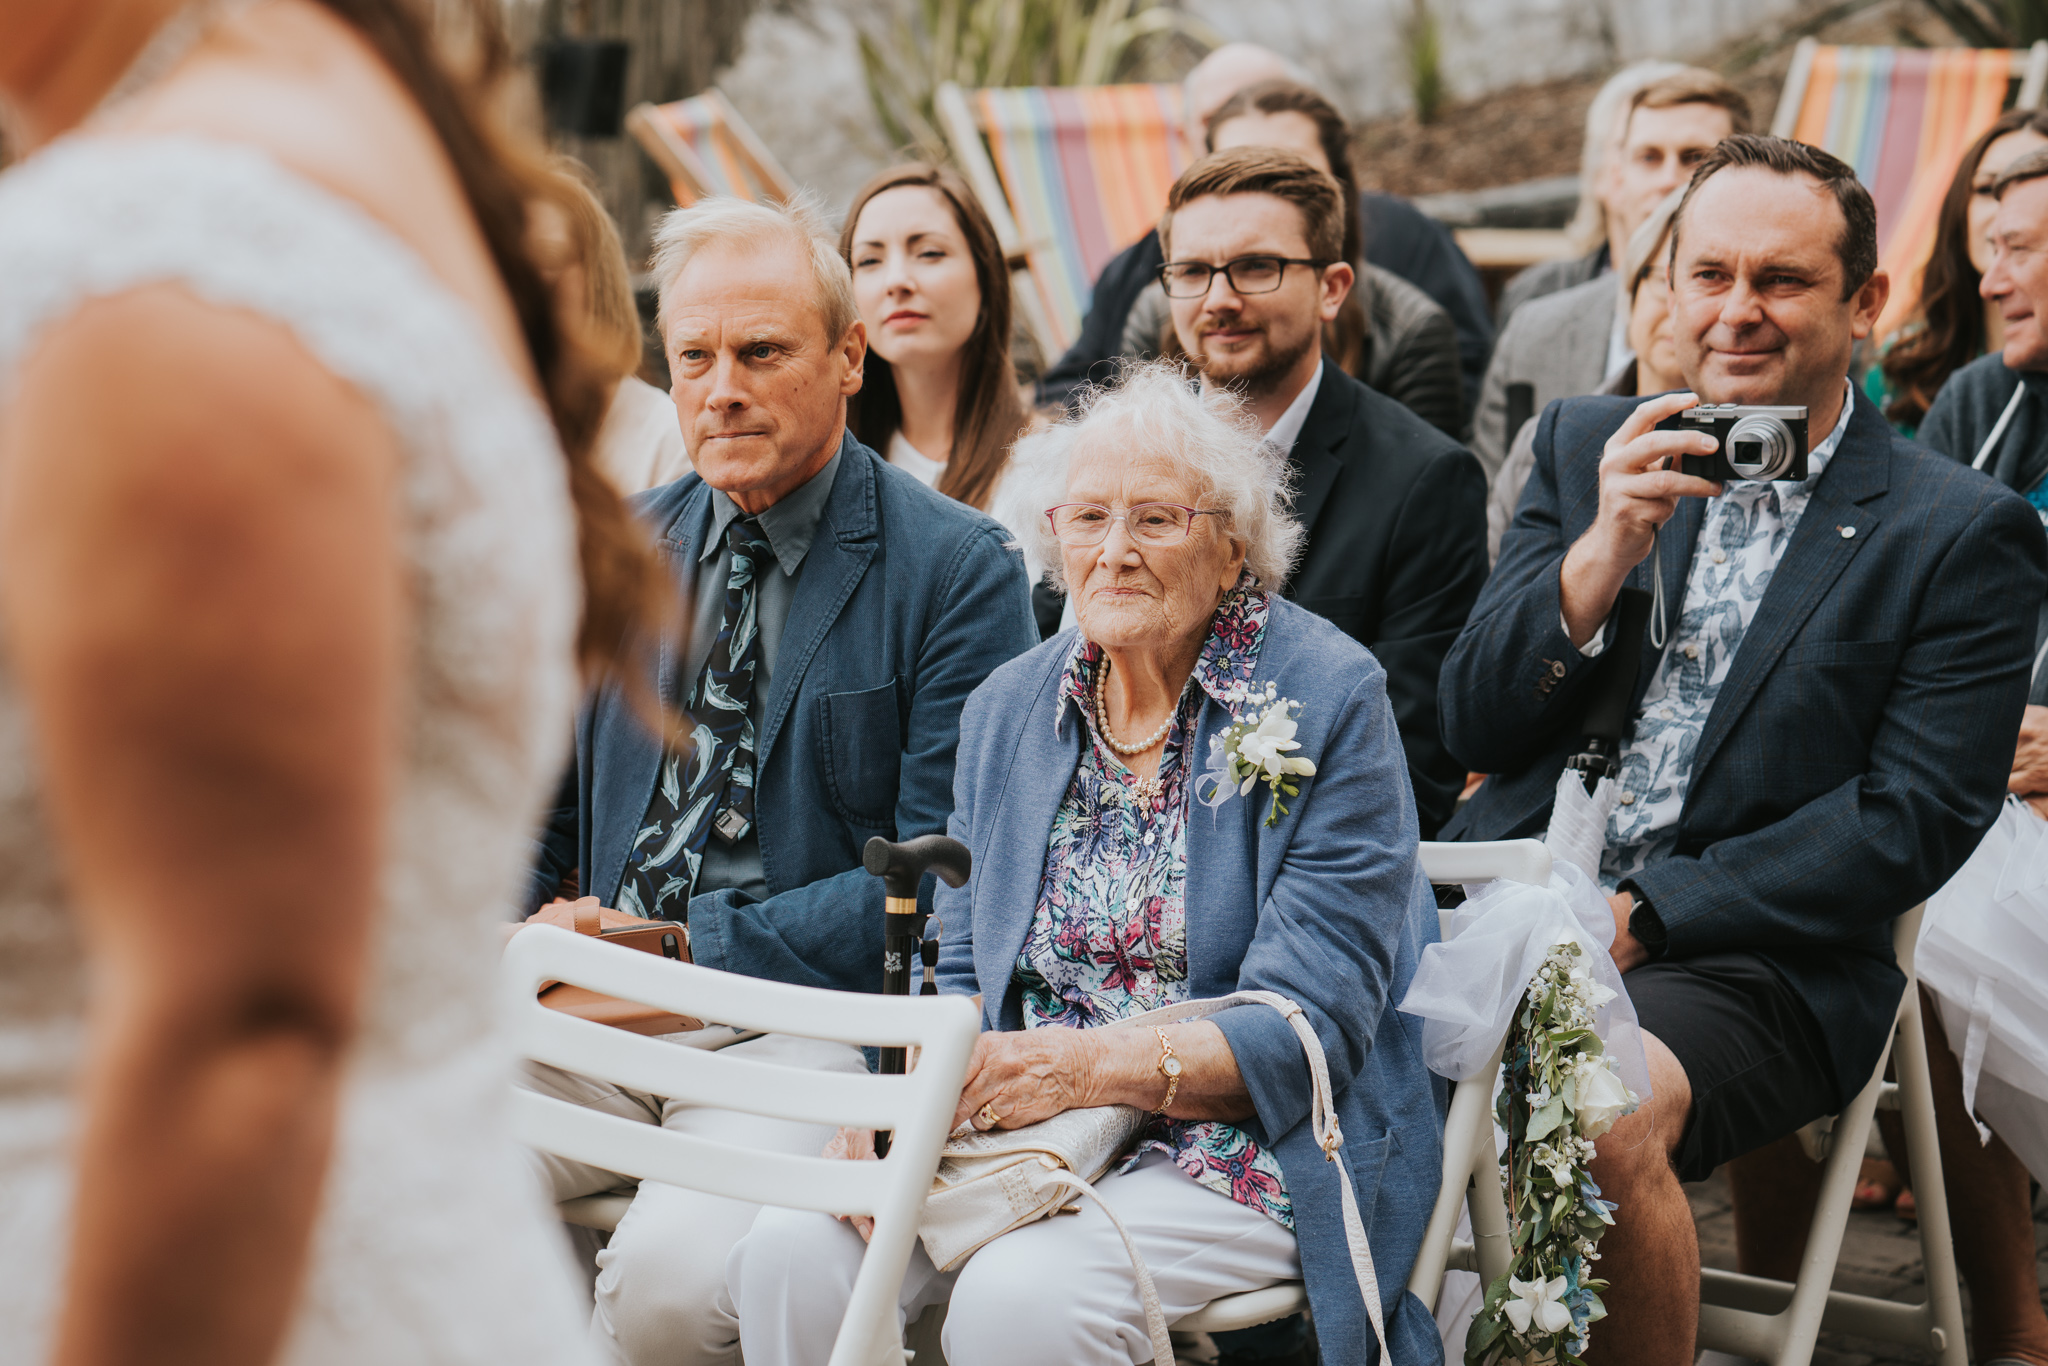 john-amy-relaxed-beach-wedding-tunnels-beaches-ilfracombe-north-devon-grace-elizabeth-colchester-essex-alternative-relaxed-wedding-photography-devon-suffolk-norfolk-essex (57 of 159).jpg